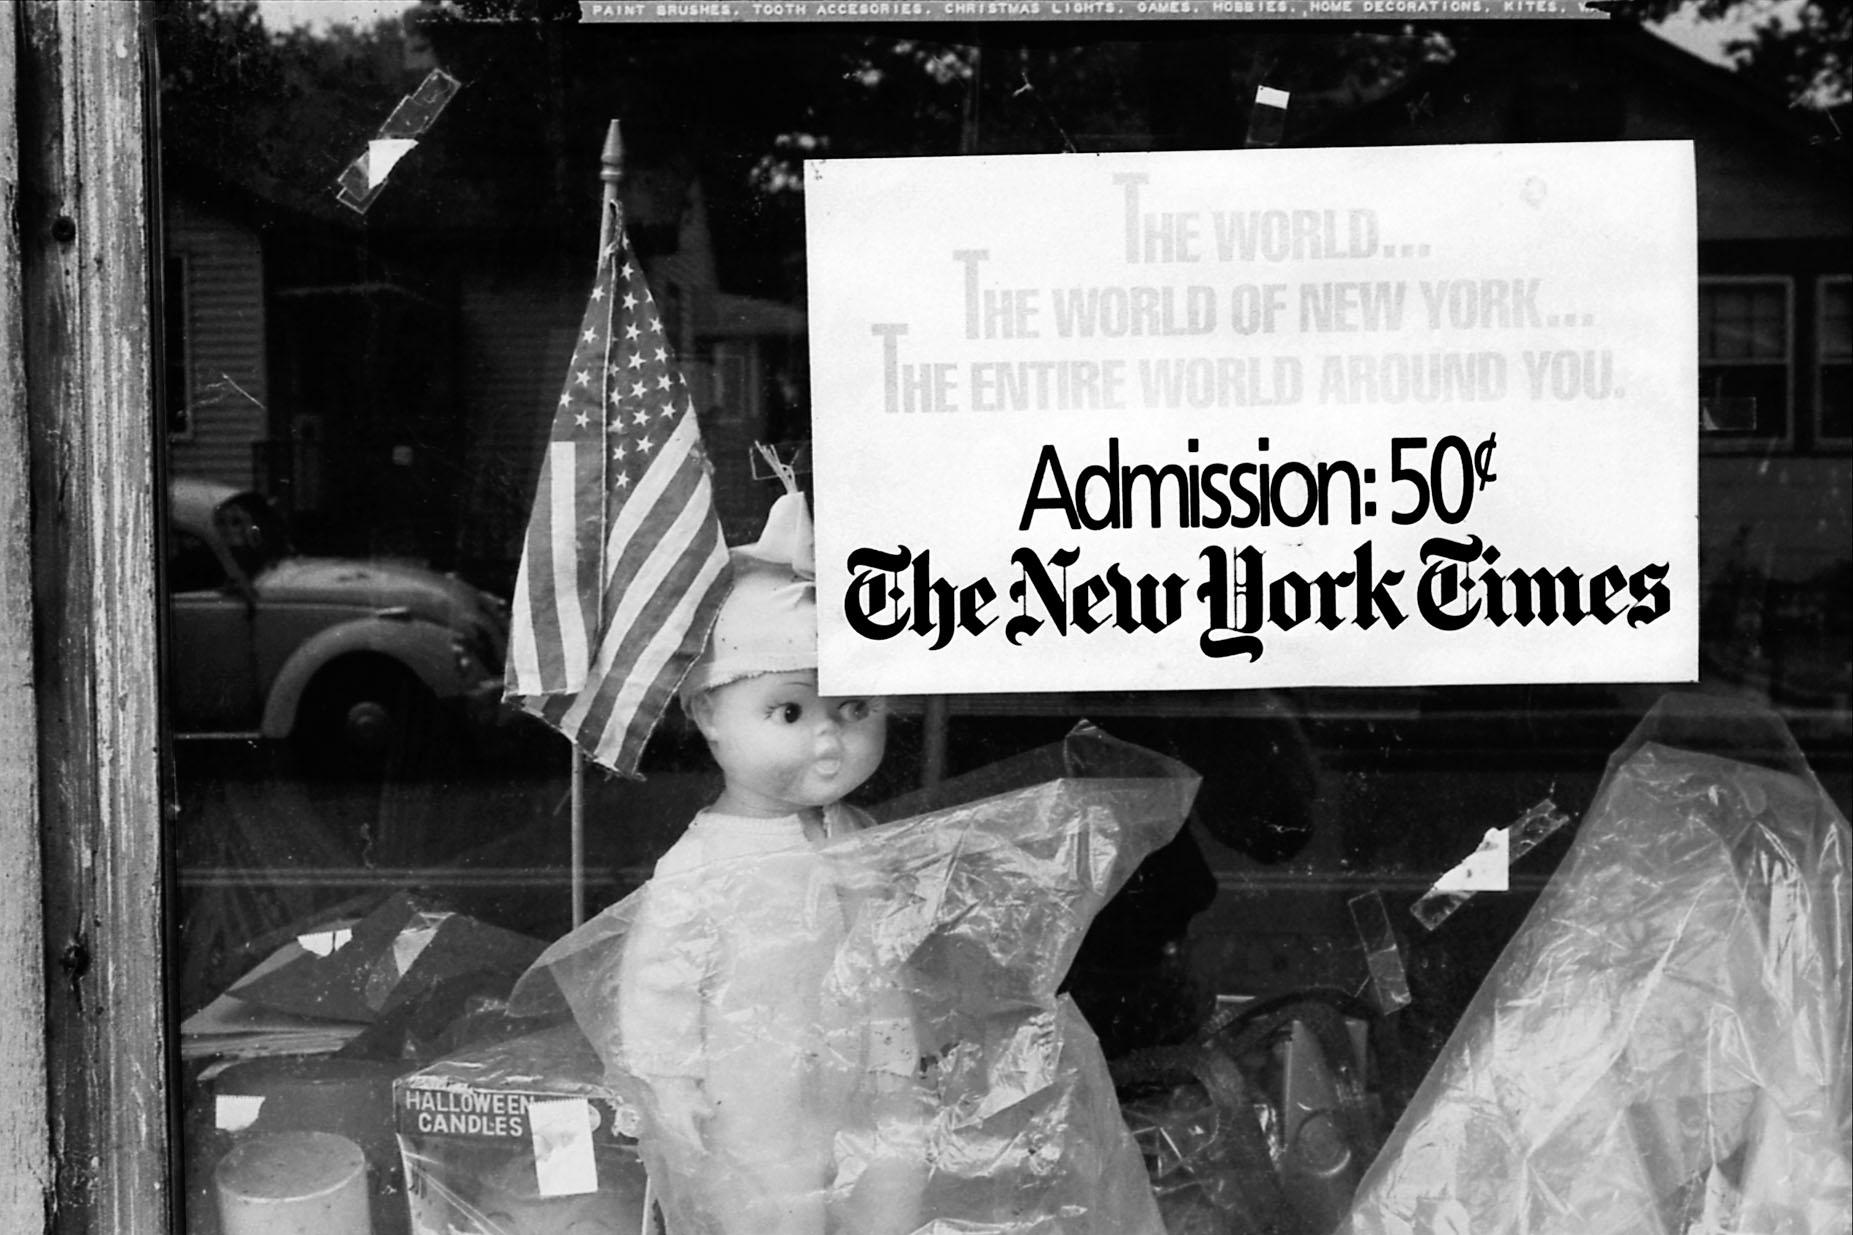 Shop window, Dumont, NJ